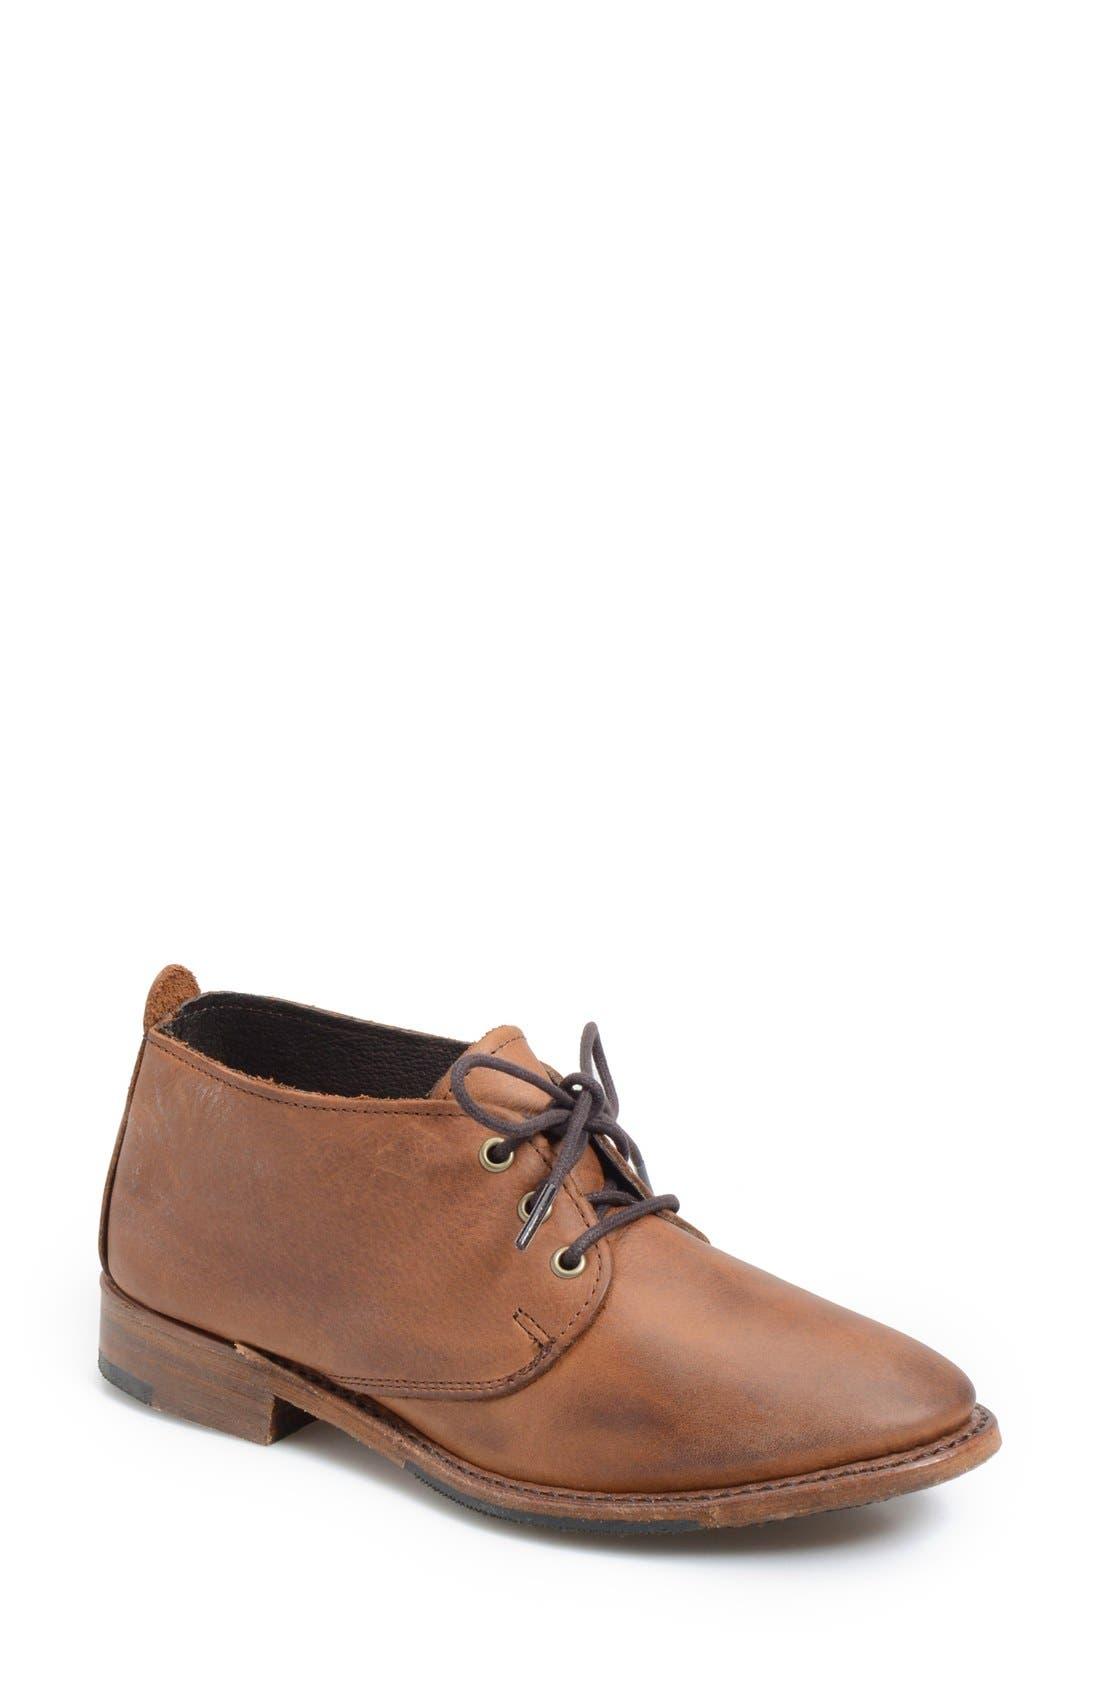 Alternate Image 1 Selected - Vintage Shoe Company 'Ansley' Chukka Boot (Women)